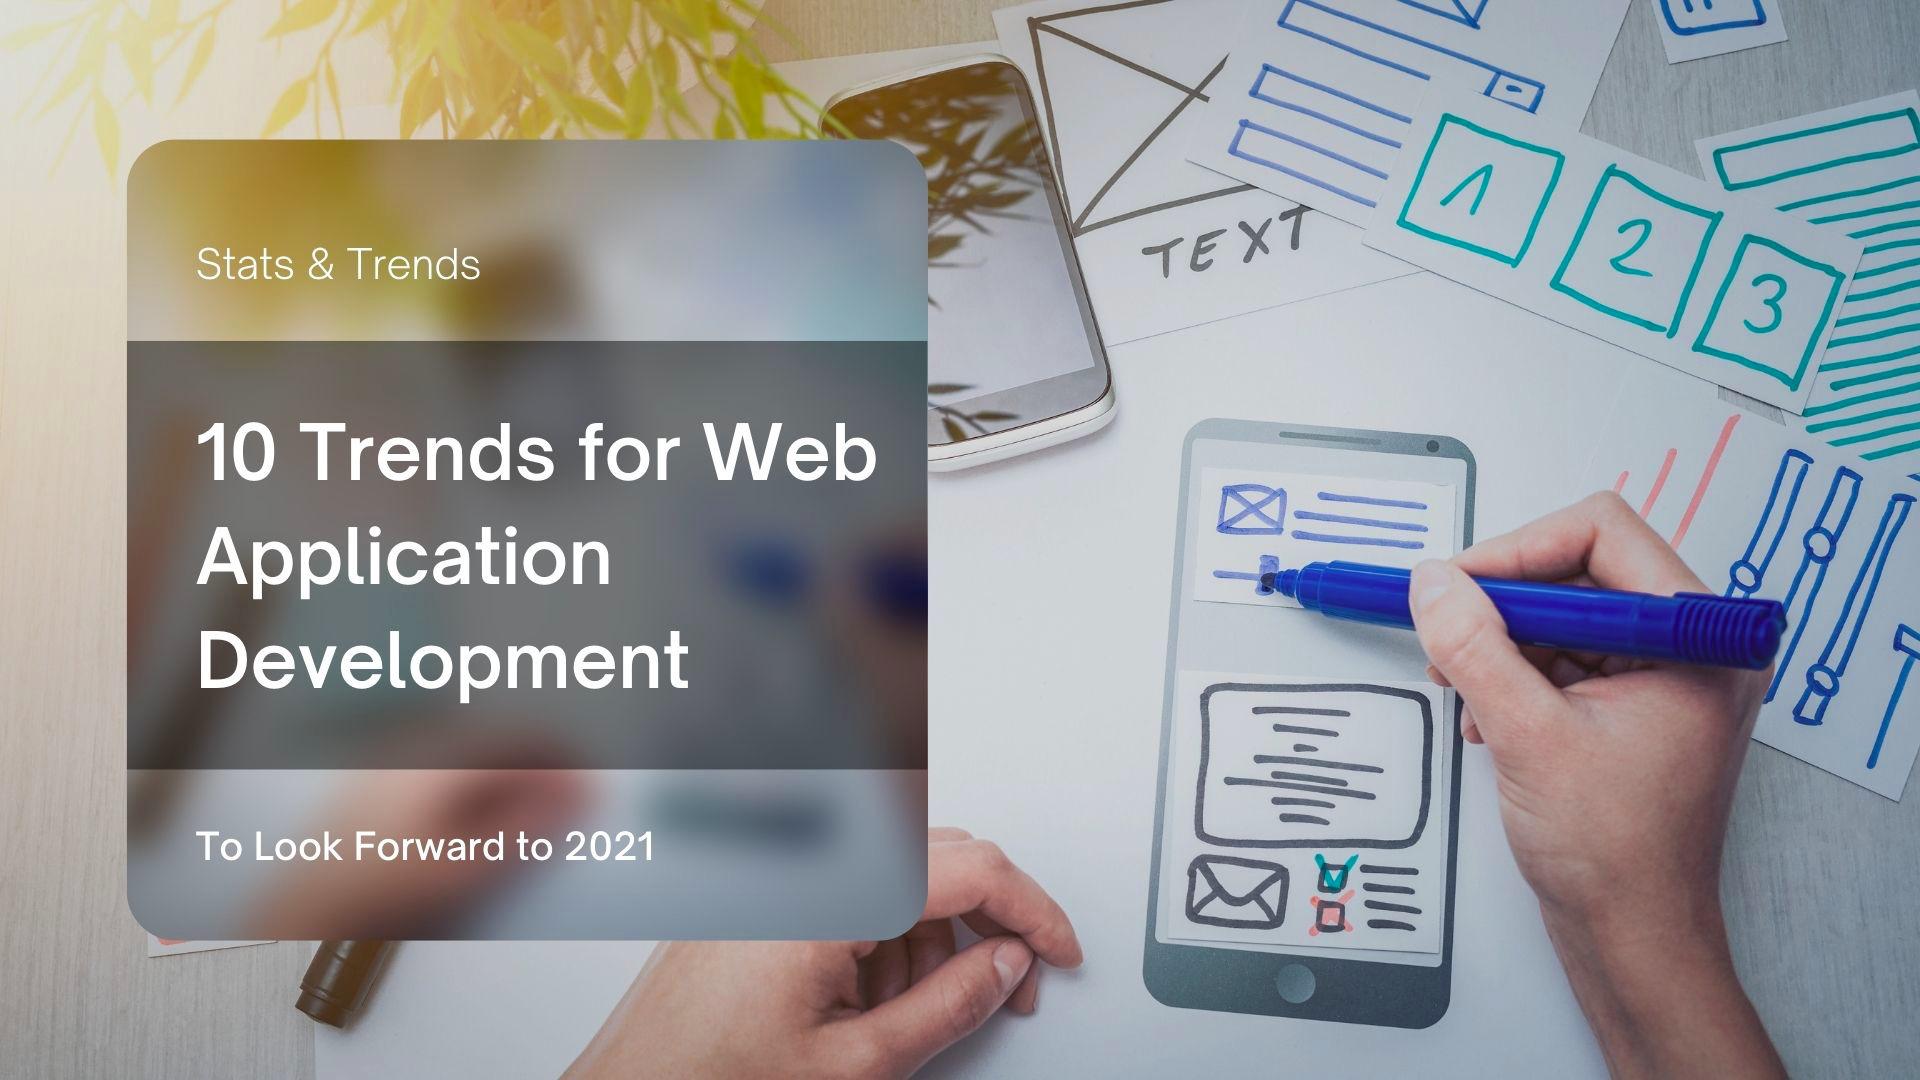 TOP 10 WEB APPLICATION DEVELOPMENT TRENDS